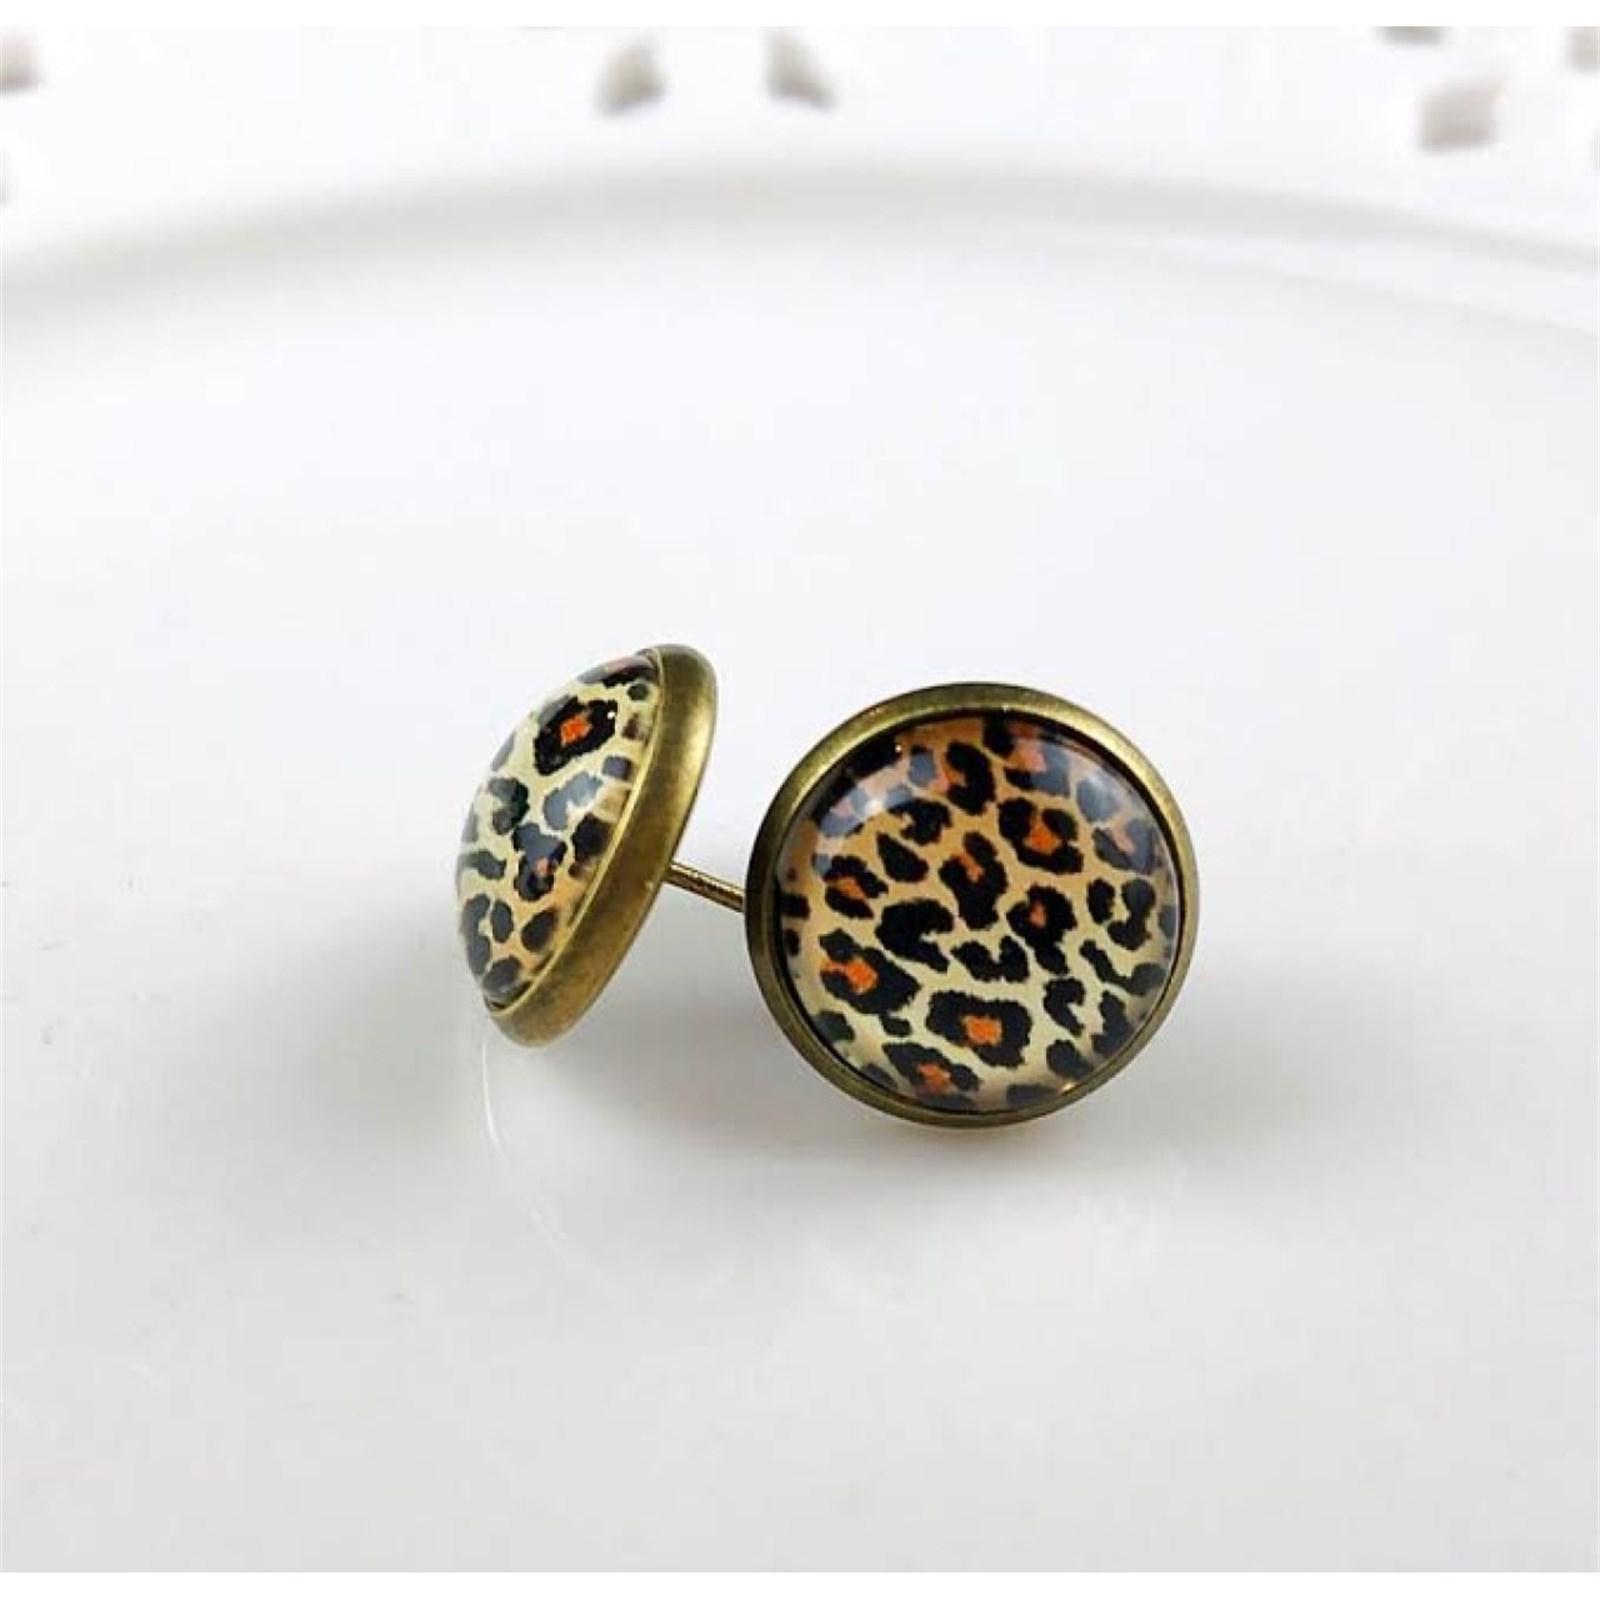 8mm Leopard Stud Earrings with black posts